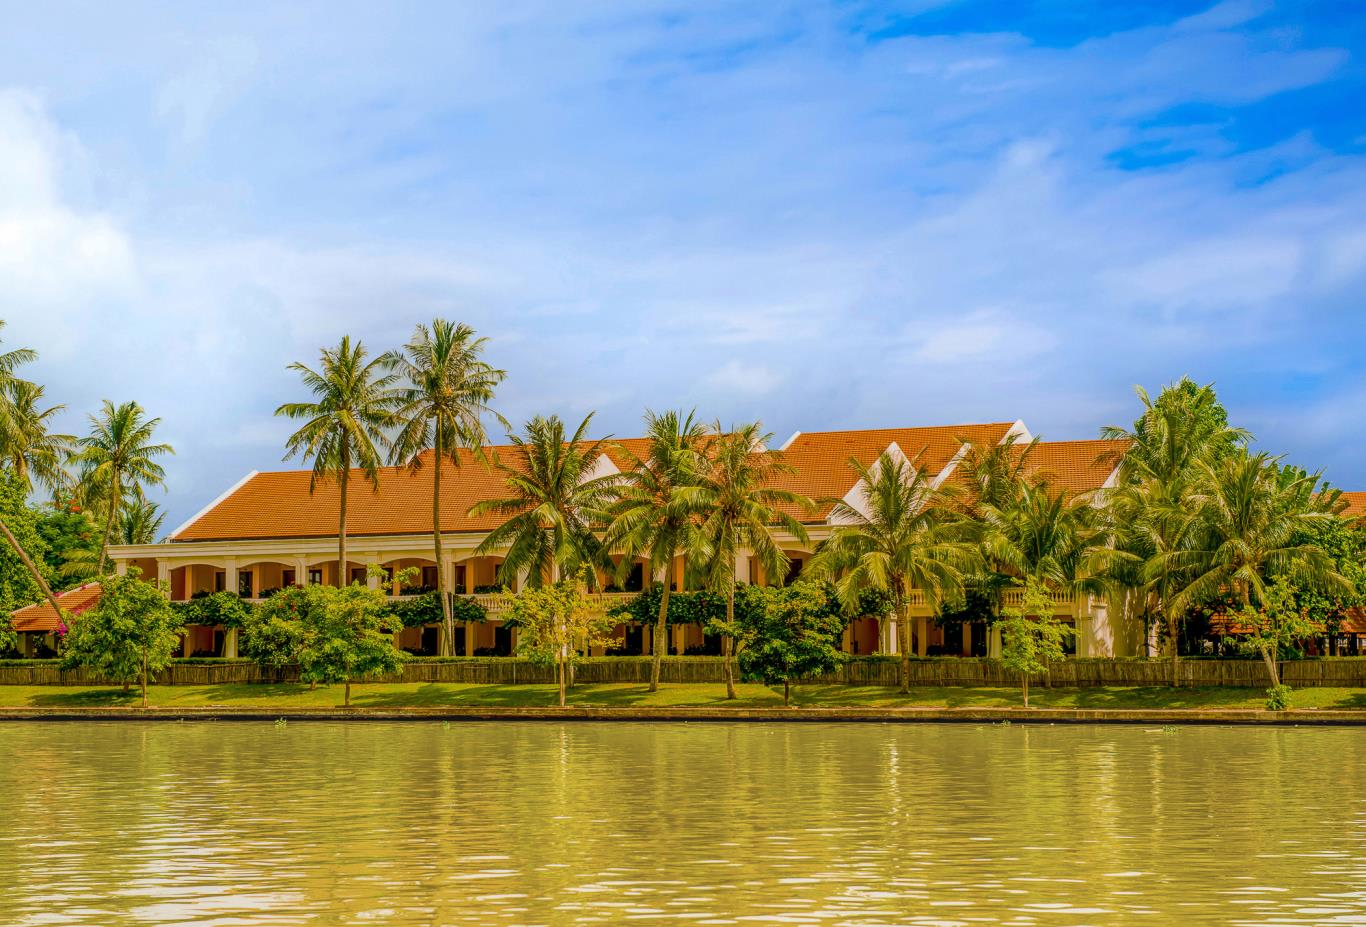 Anantara_Hoi_An_Resort2-nws